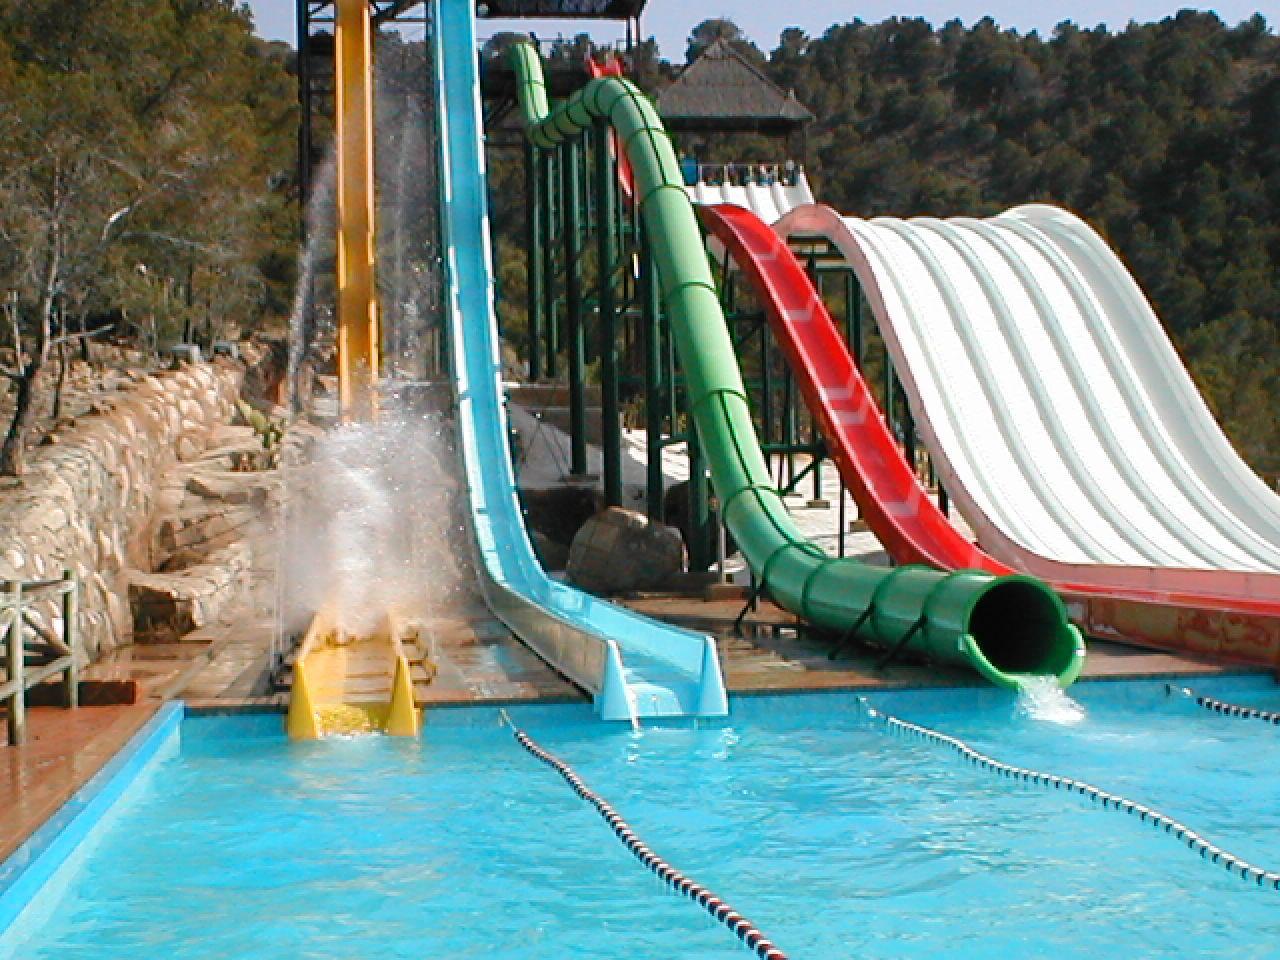 Big Bang Benidorm' Aqualandia Waterpark - In Fact